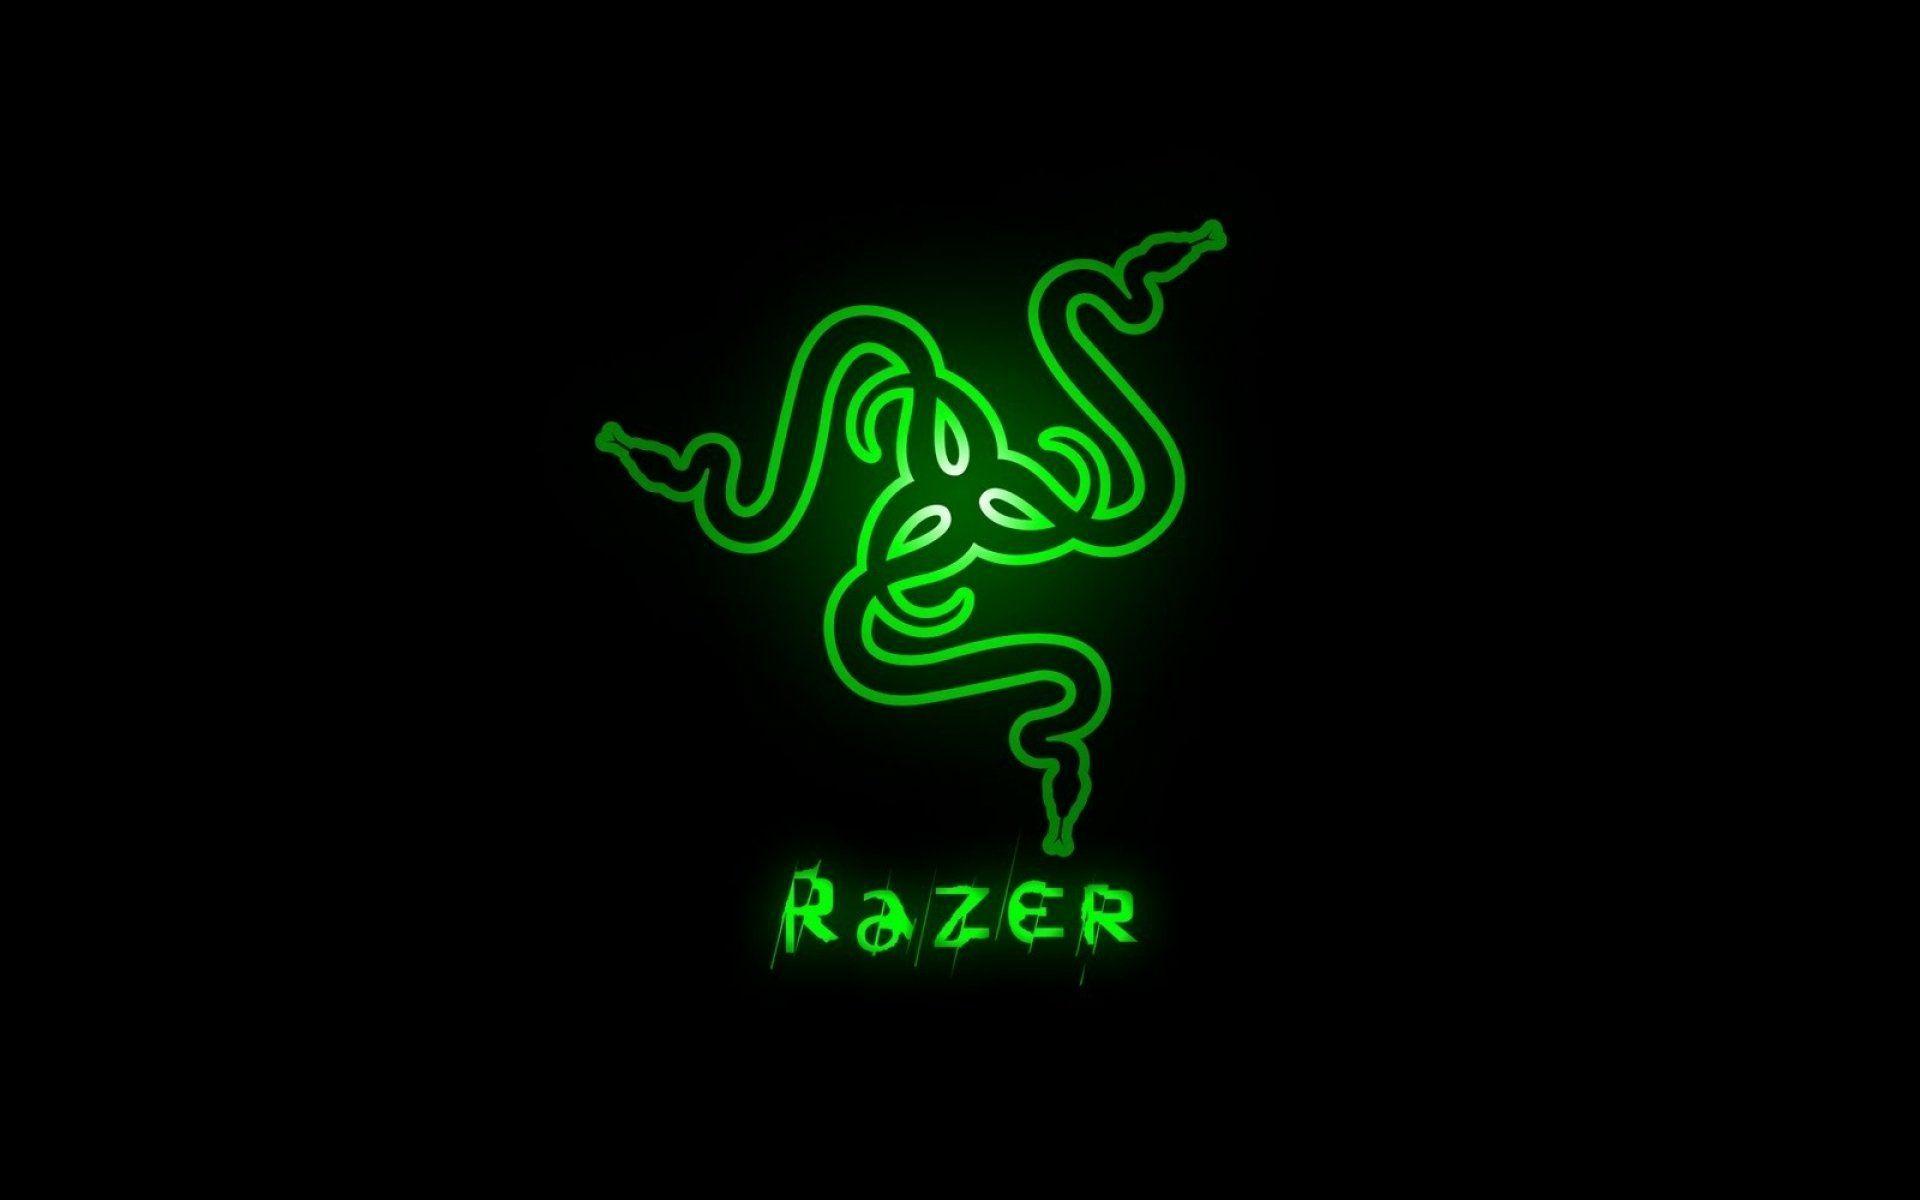 Razer Gaming Wallpapers  Wallpaper Cave